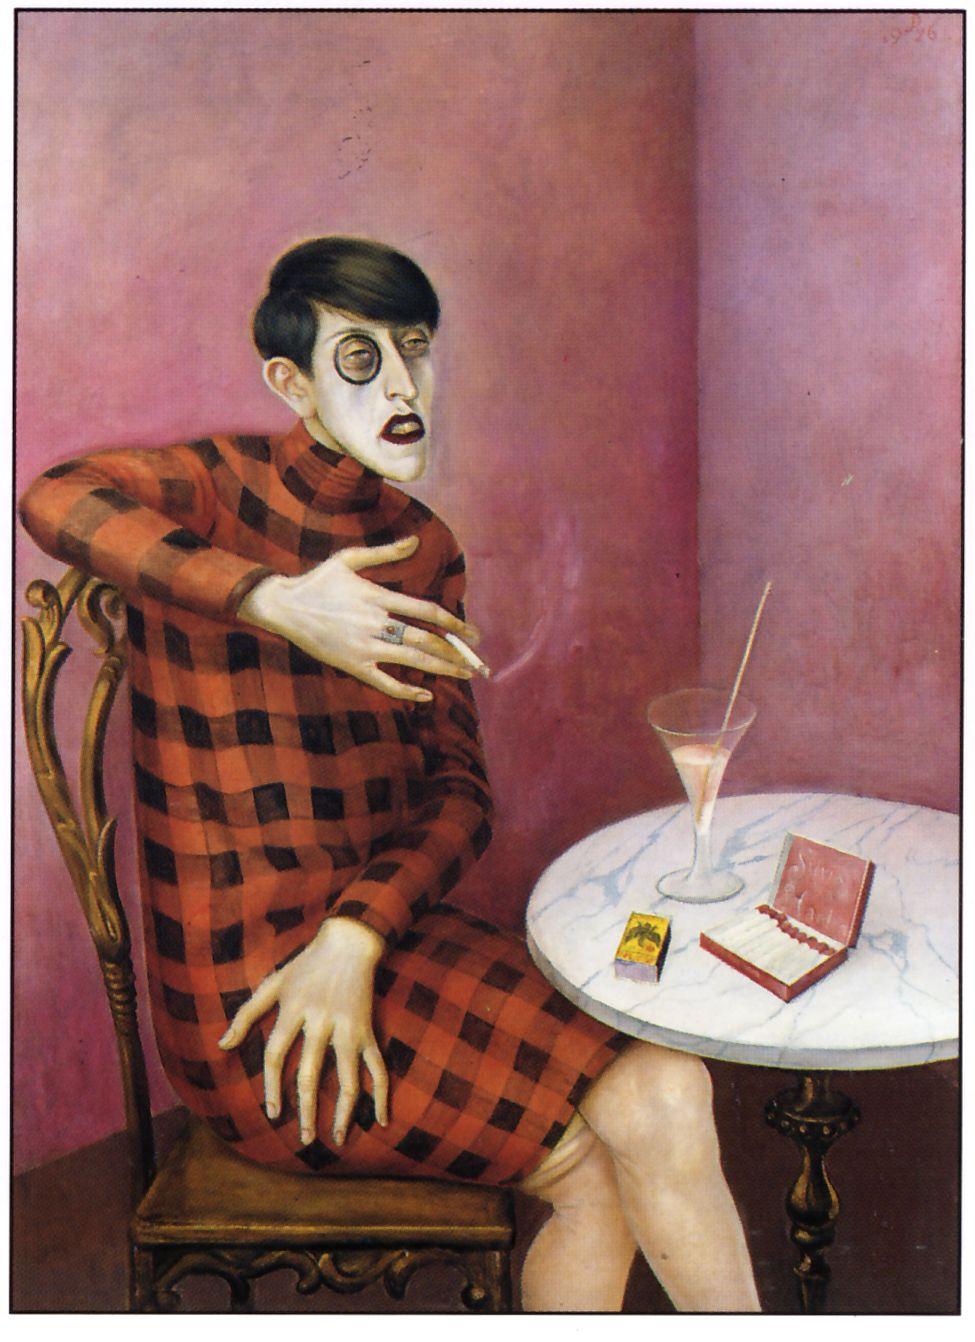 Otto Dix, la journaliste Sylvia von Harden (1926)